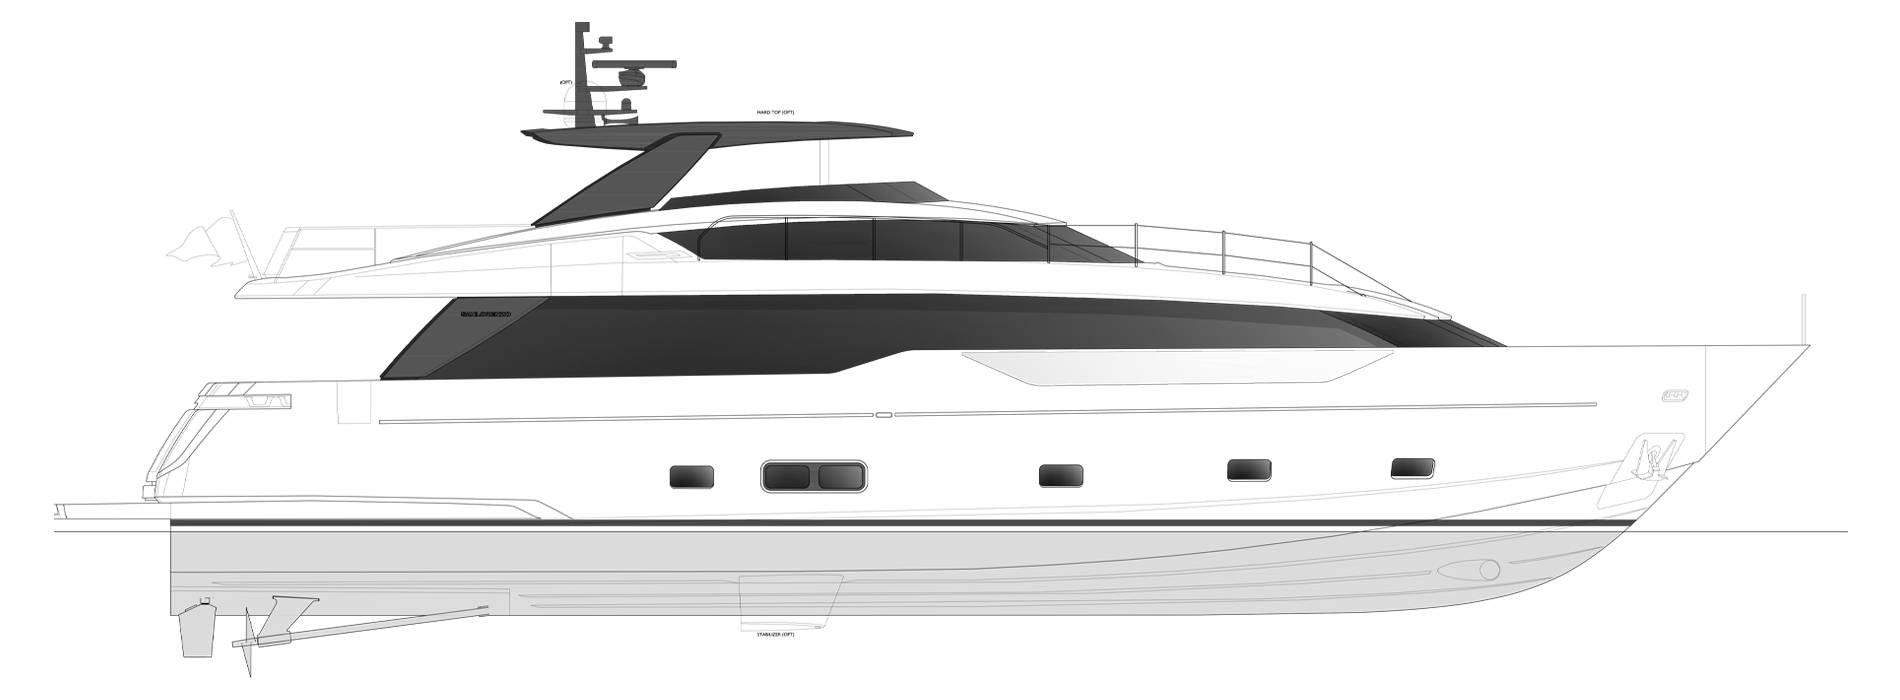 Sanlorenzo Yachts SL90 Asymmetric Профиль